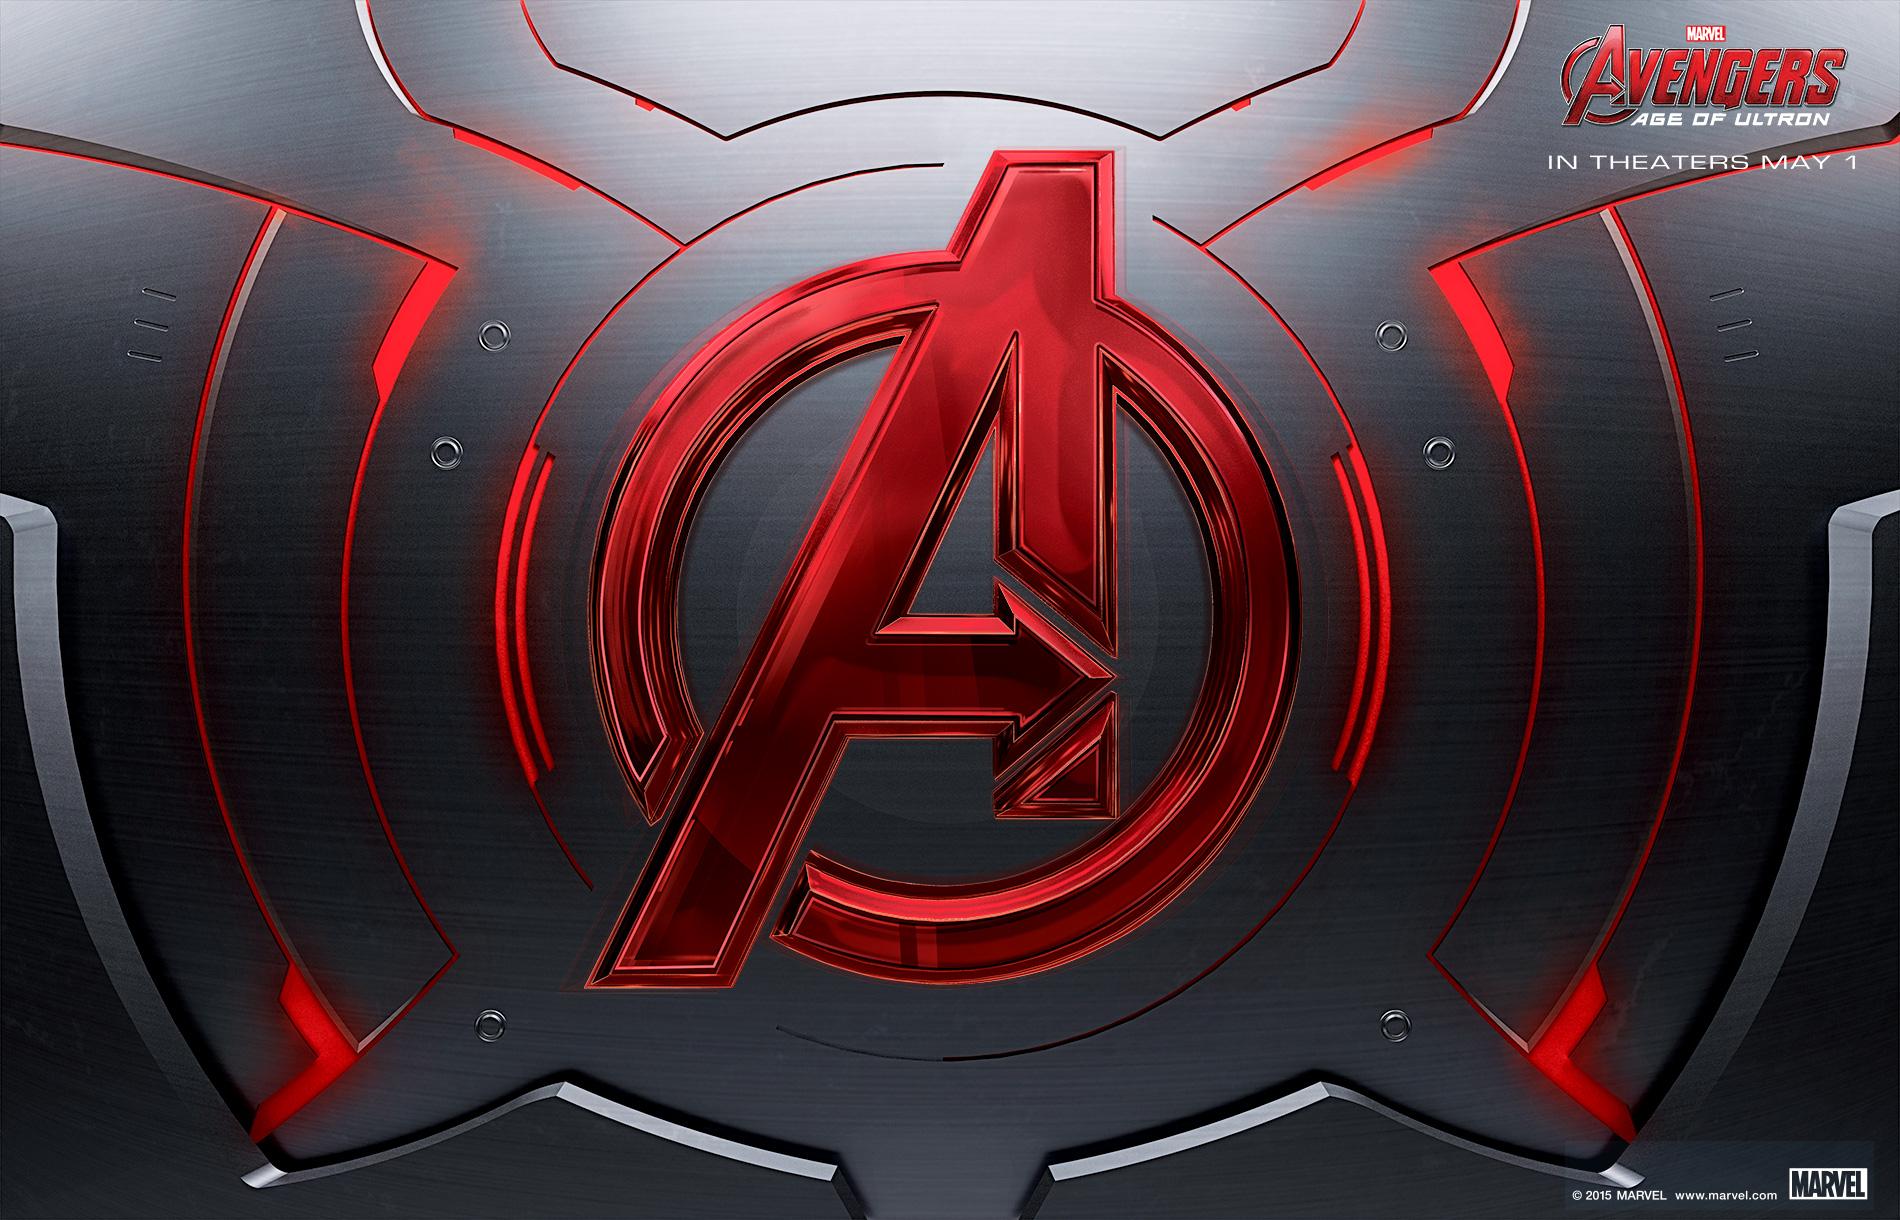 Category The Avengers Images Disney Wiki Fandom